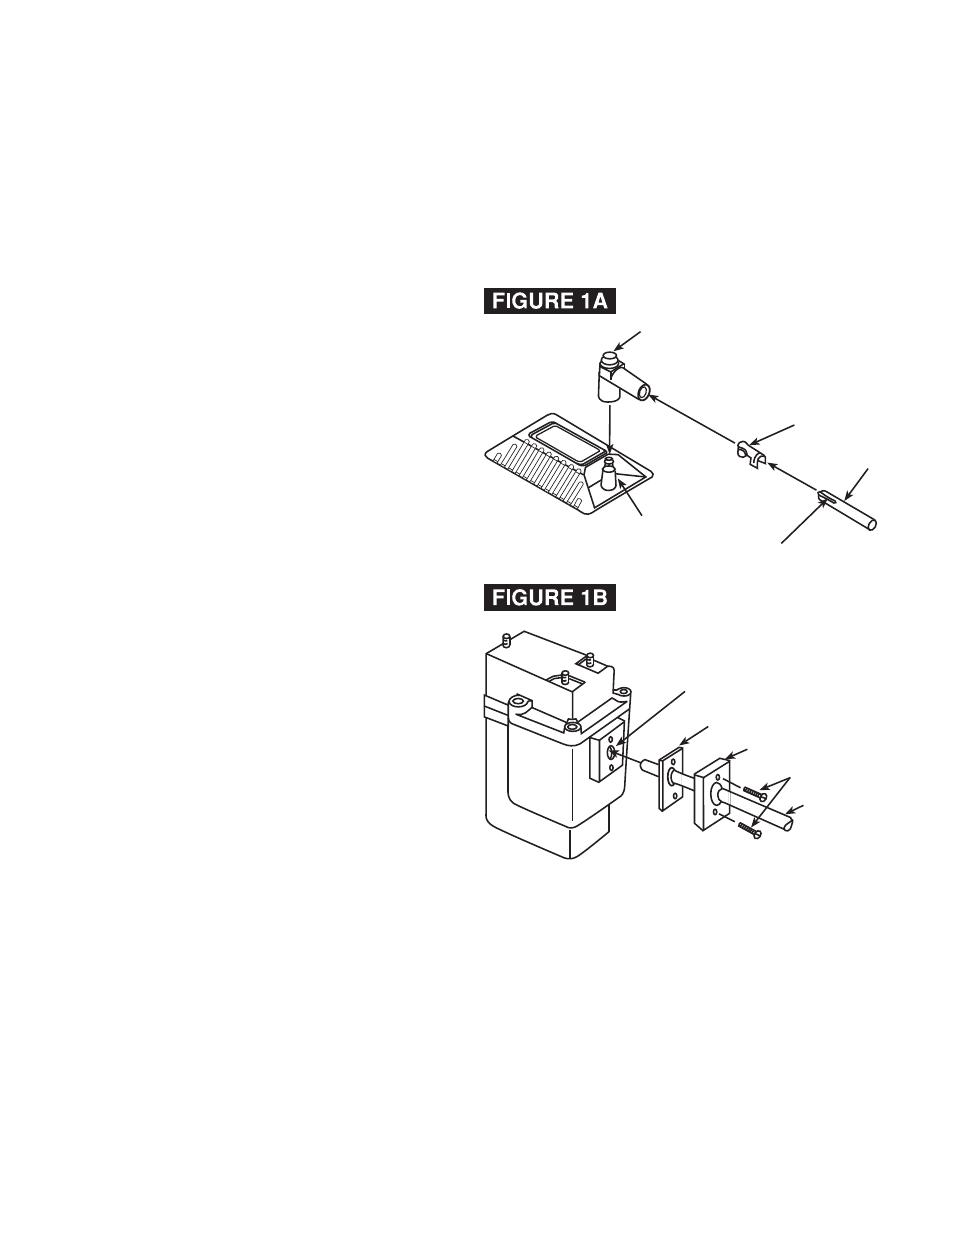 medium resolution of mallory voltmaster wiring diagram detailed schematics mallory hei distributor wiring diagram mallory unilite wiring diagram